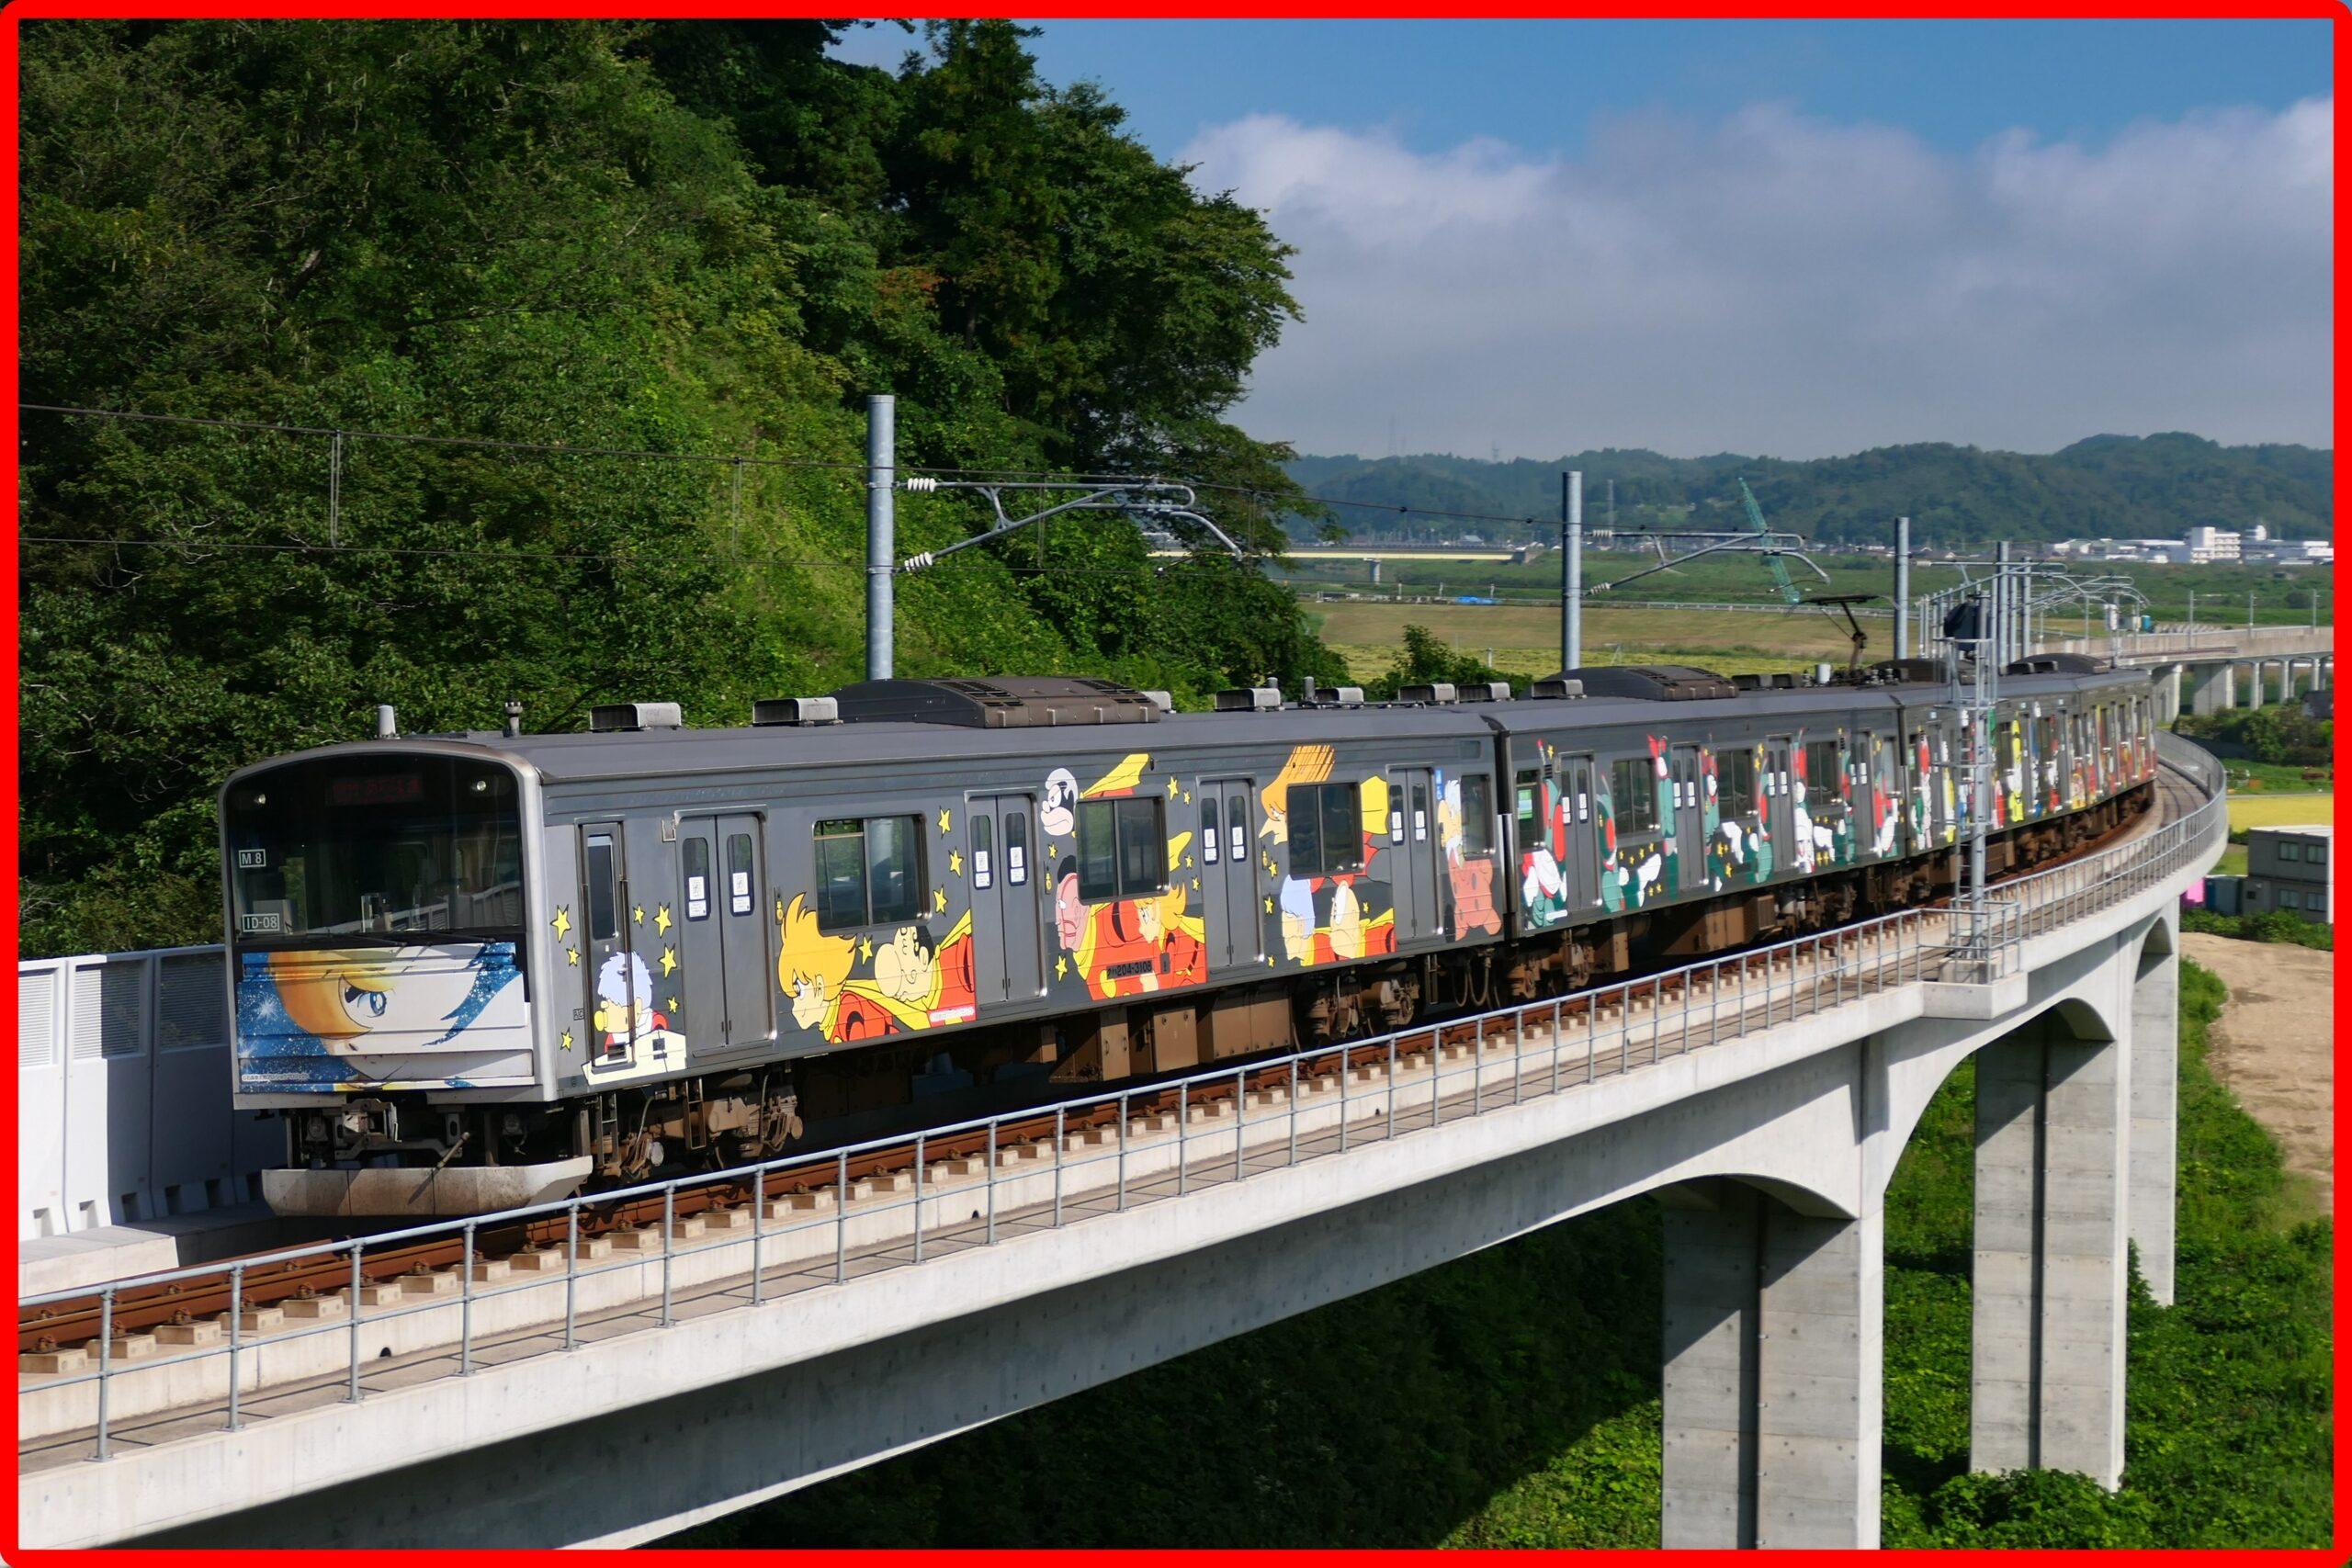 【205系引退】仙石線向けE131系投入へ JR東日本発表